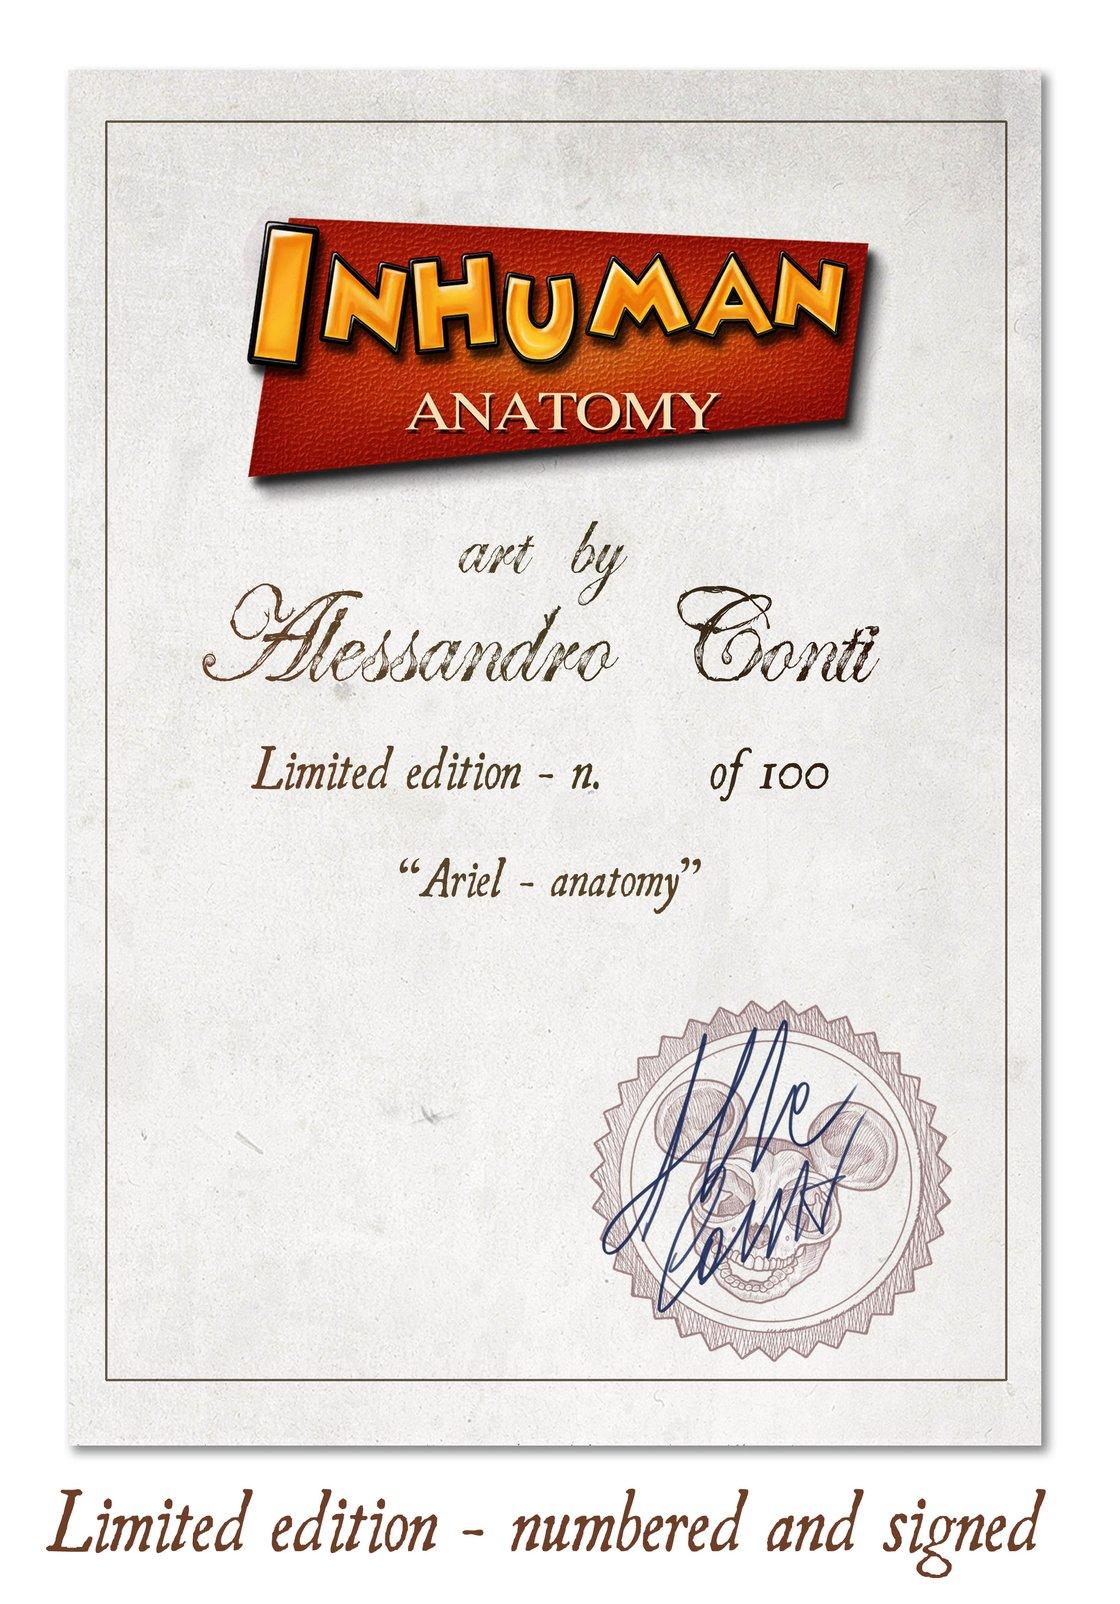 Image of INHUMAN ANATOMY - Ariel's anatomy - limited edition of 100 Giclèe print on fine art canvas